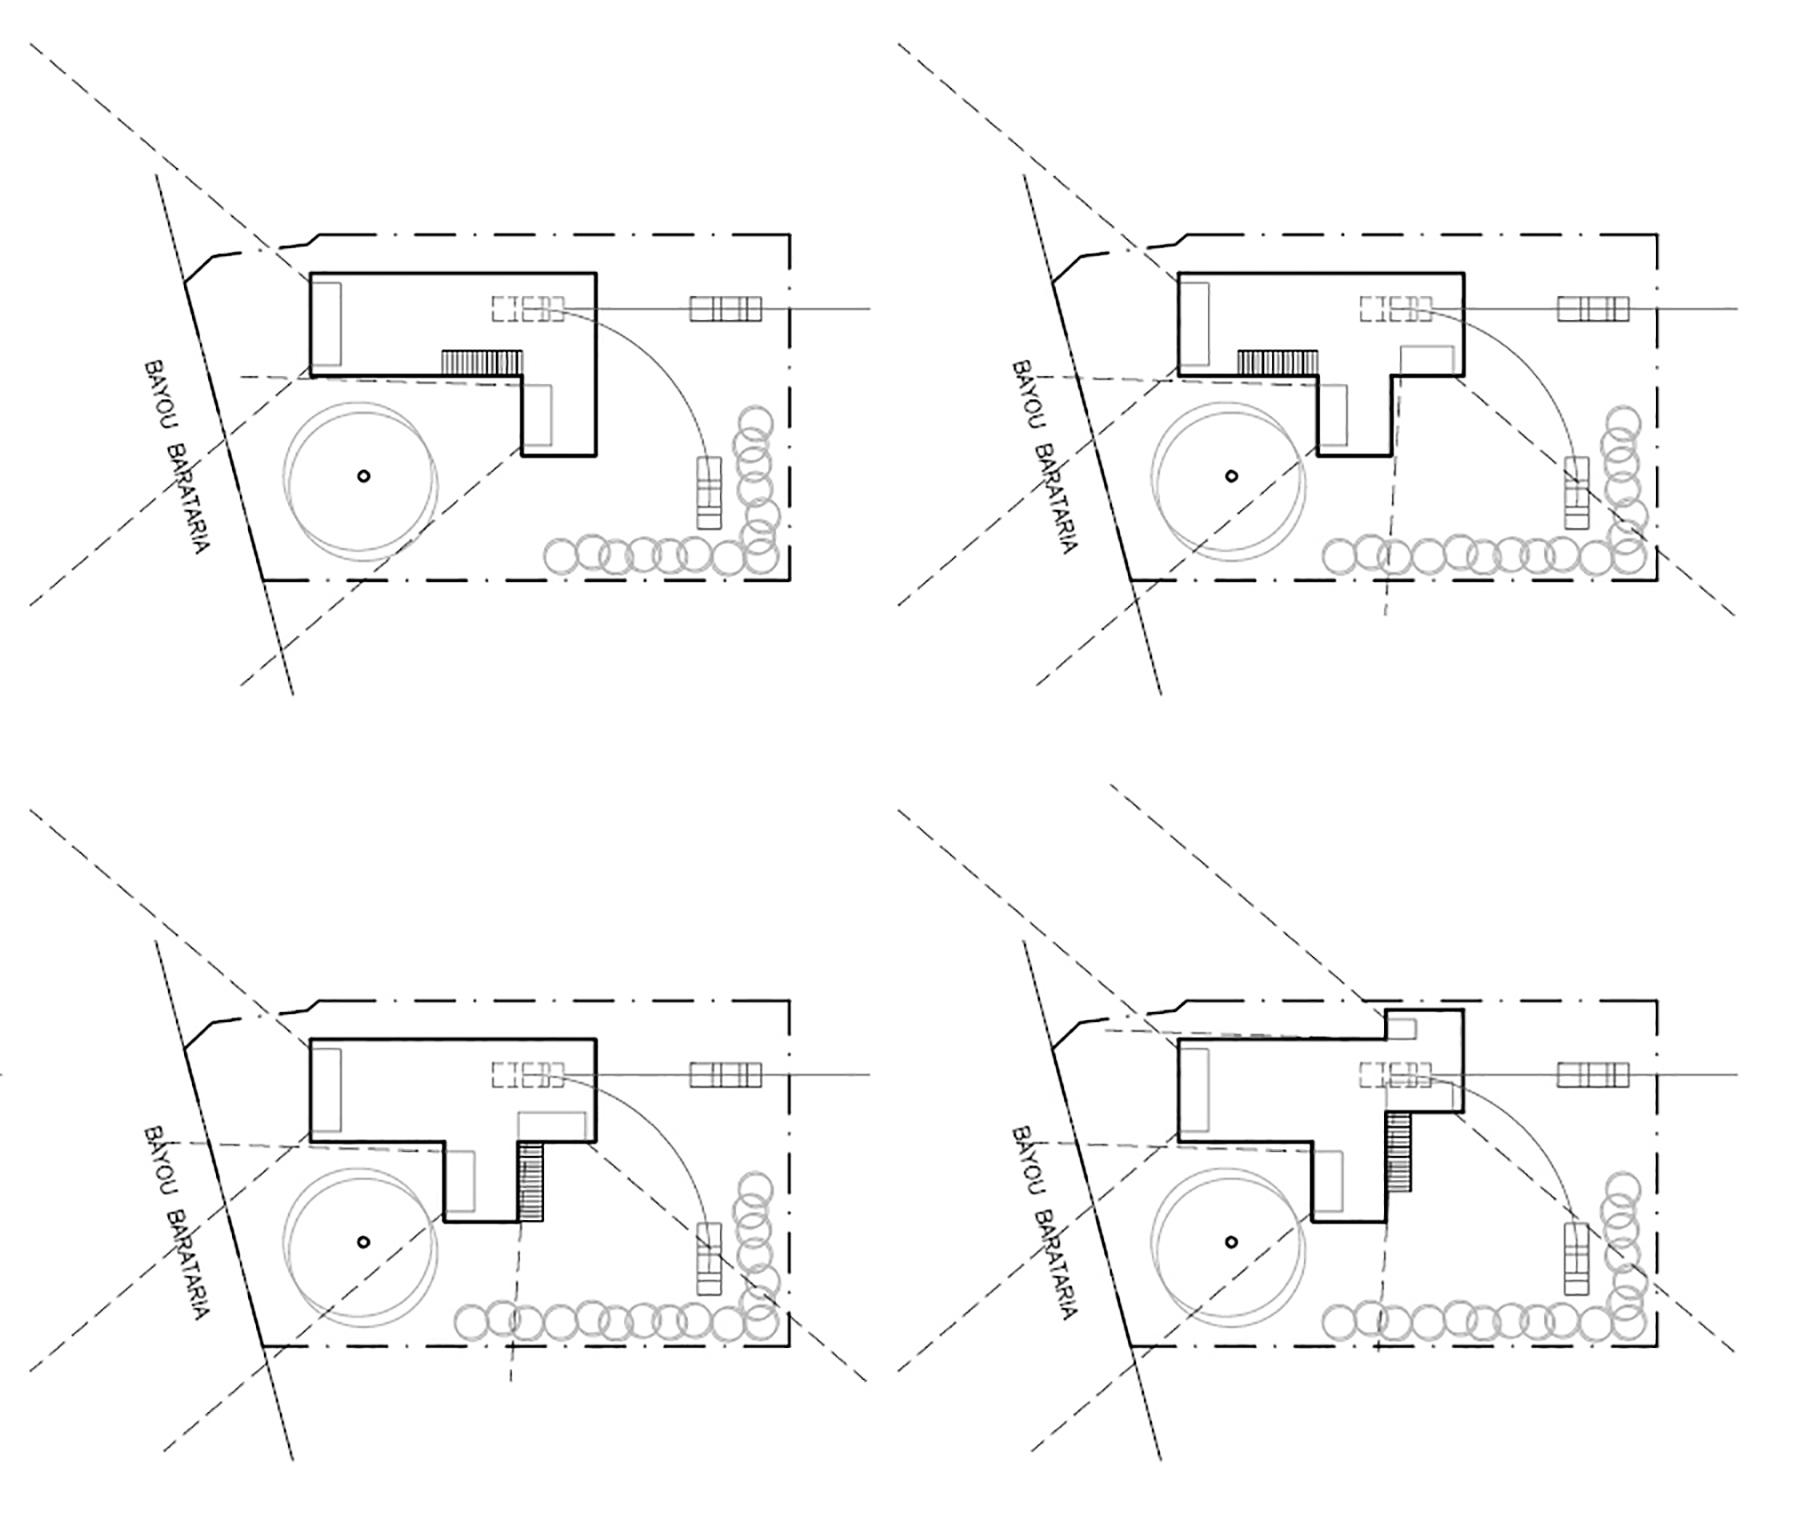 LAFITTE_web_final_new5 - Copy.jpg